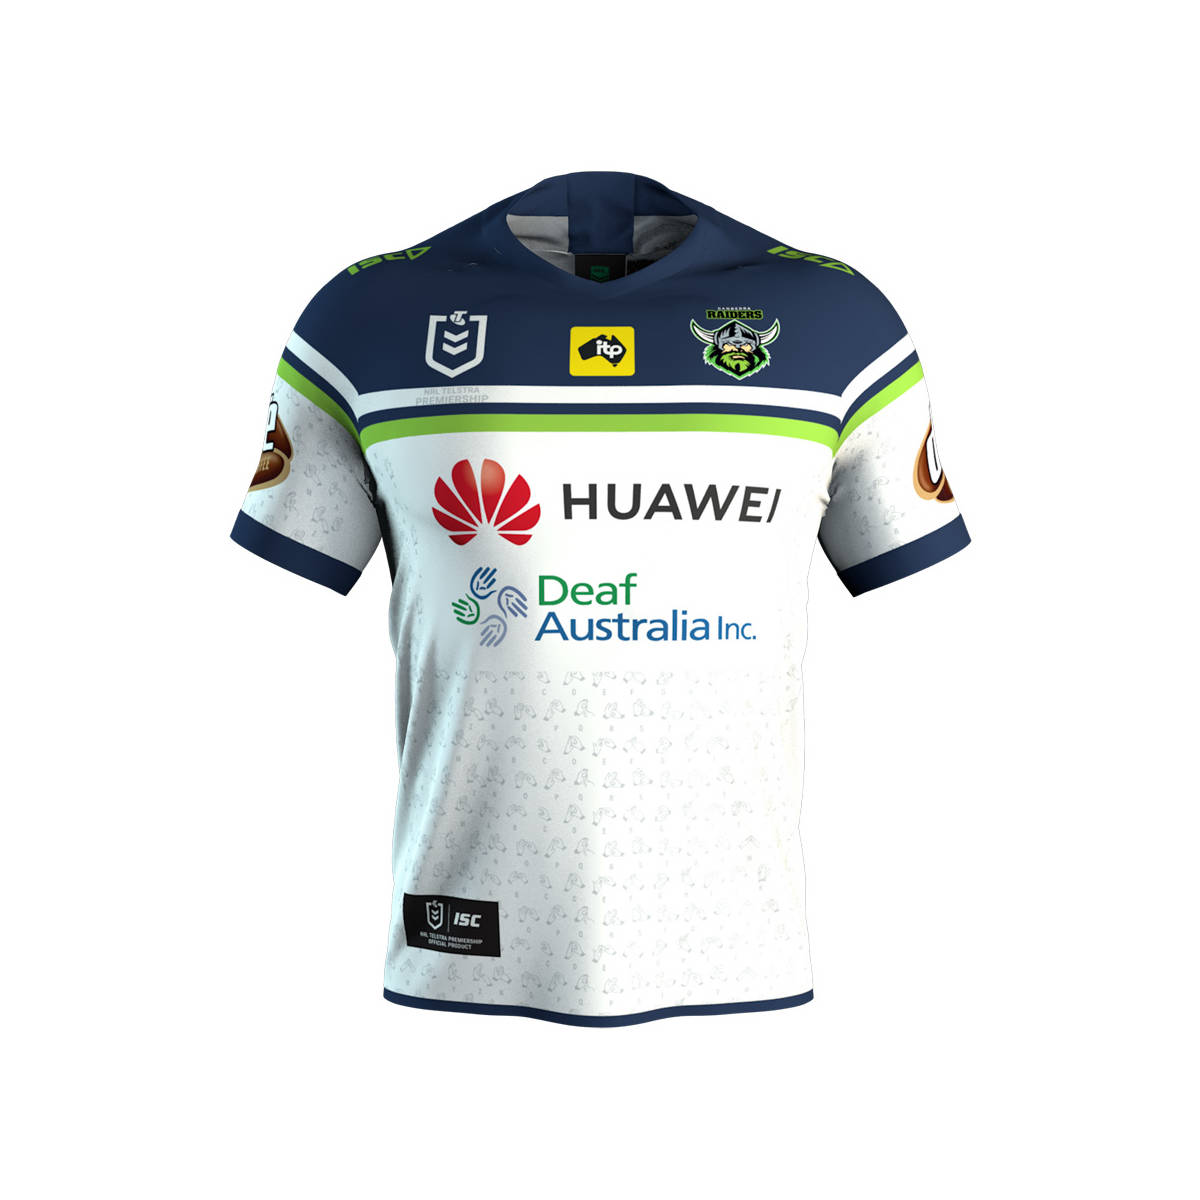 2019 Raiders Adults Huawei Charity Jersey0